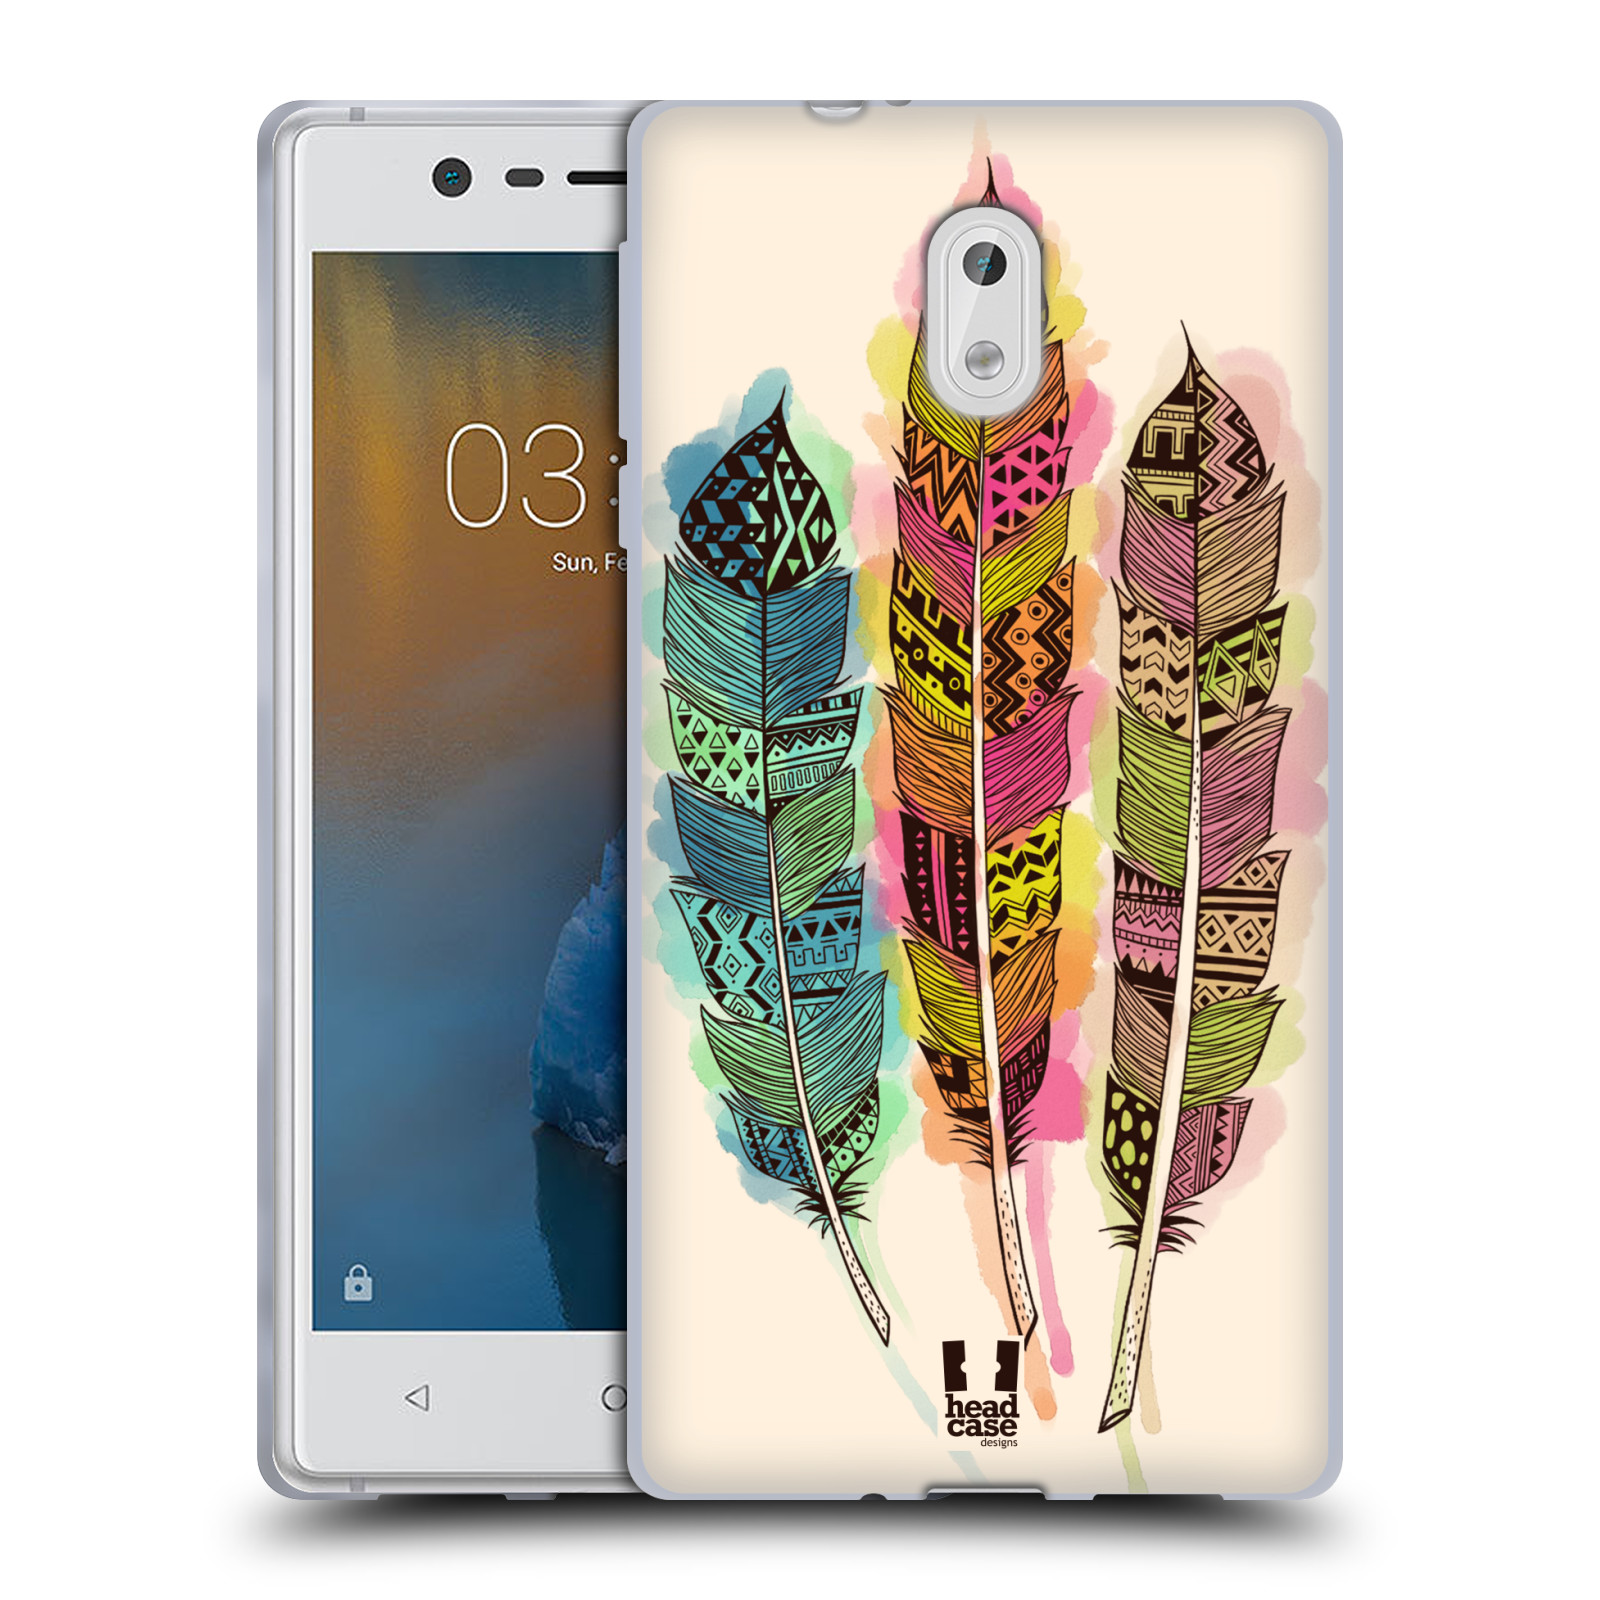 Silikonové pouzdro na mobil Nokia 3 Head Case - AZTEC PÍRKA SPLASH